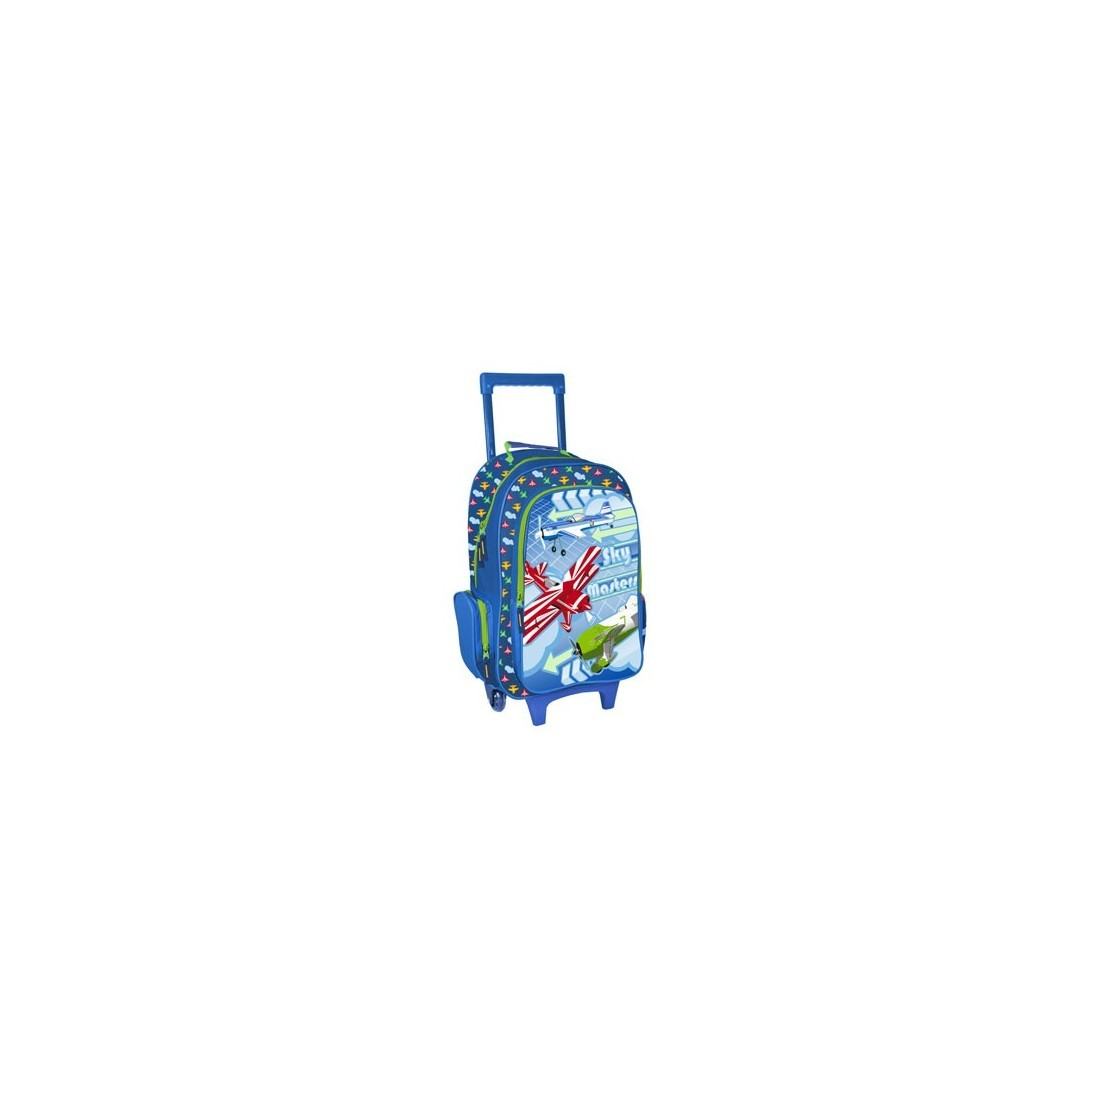 Plecak na kółkach Samoloty